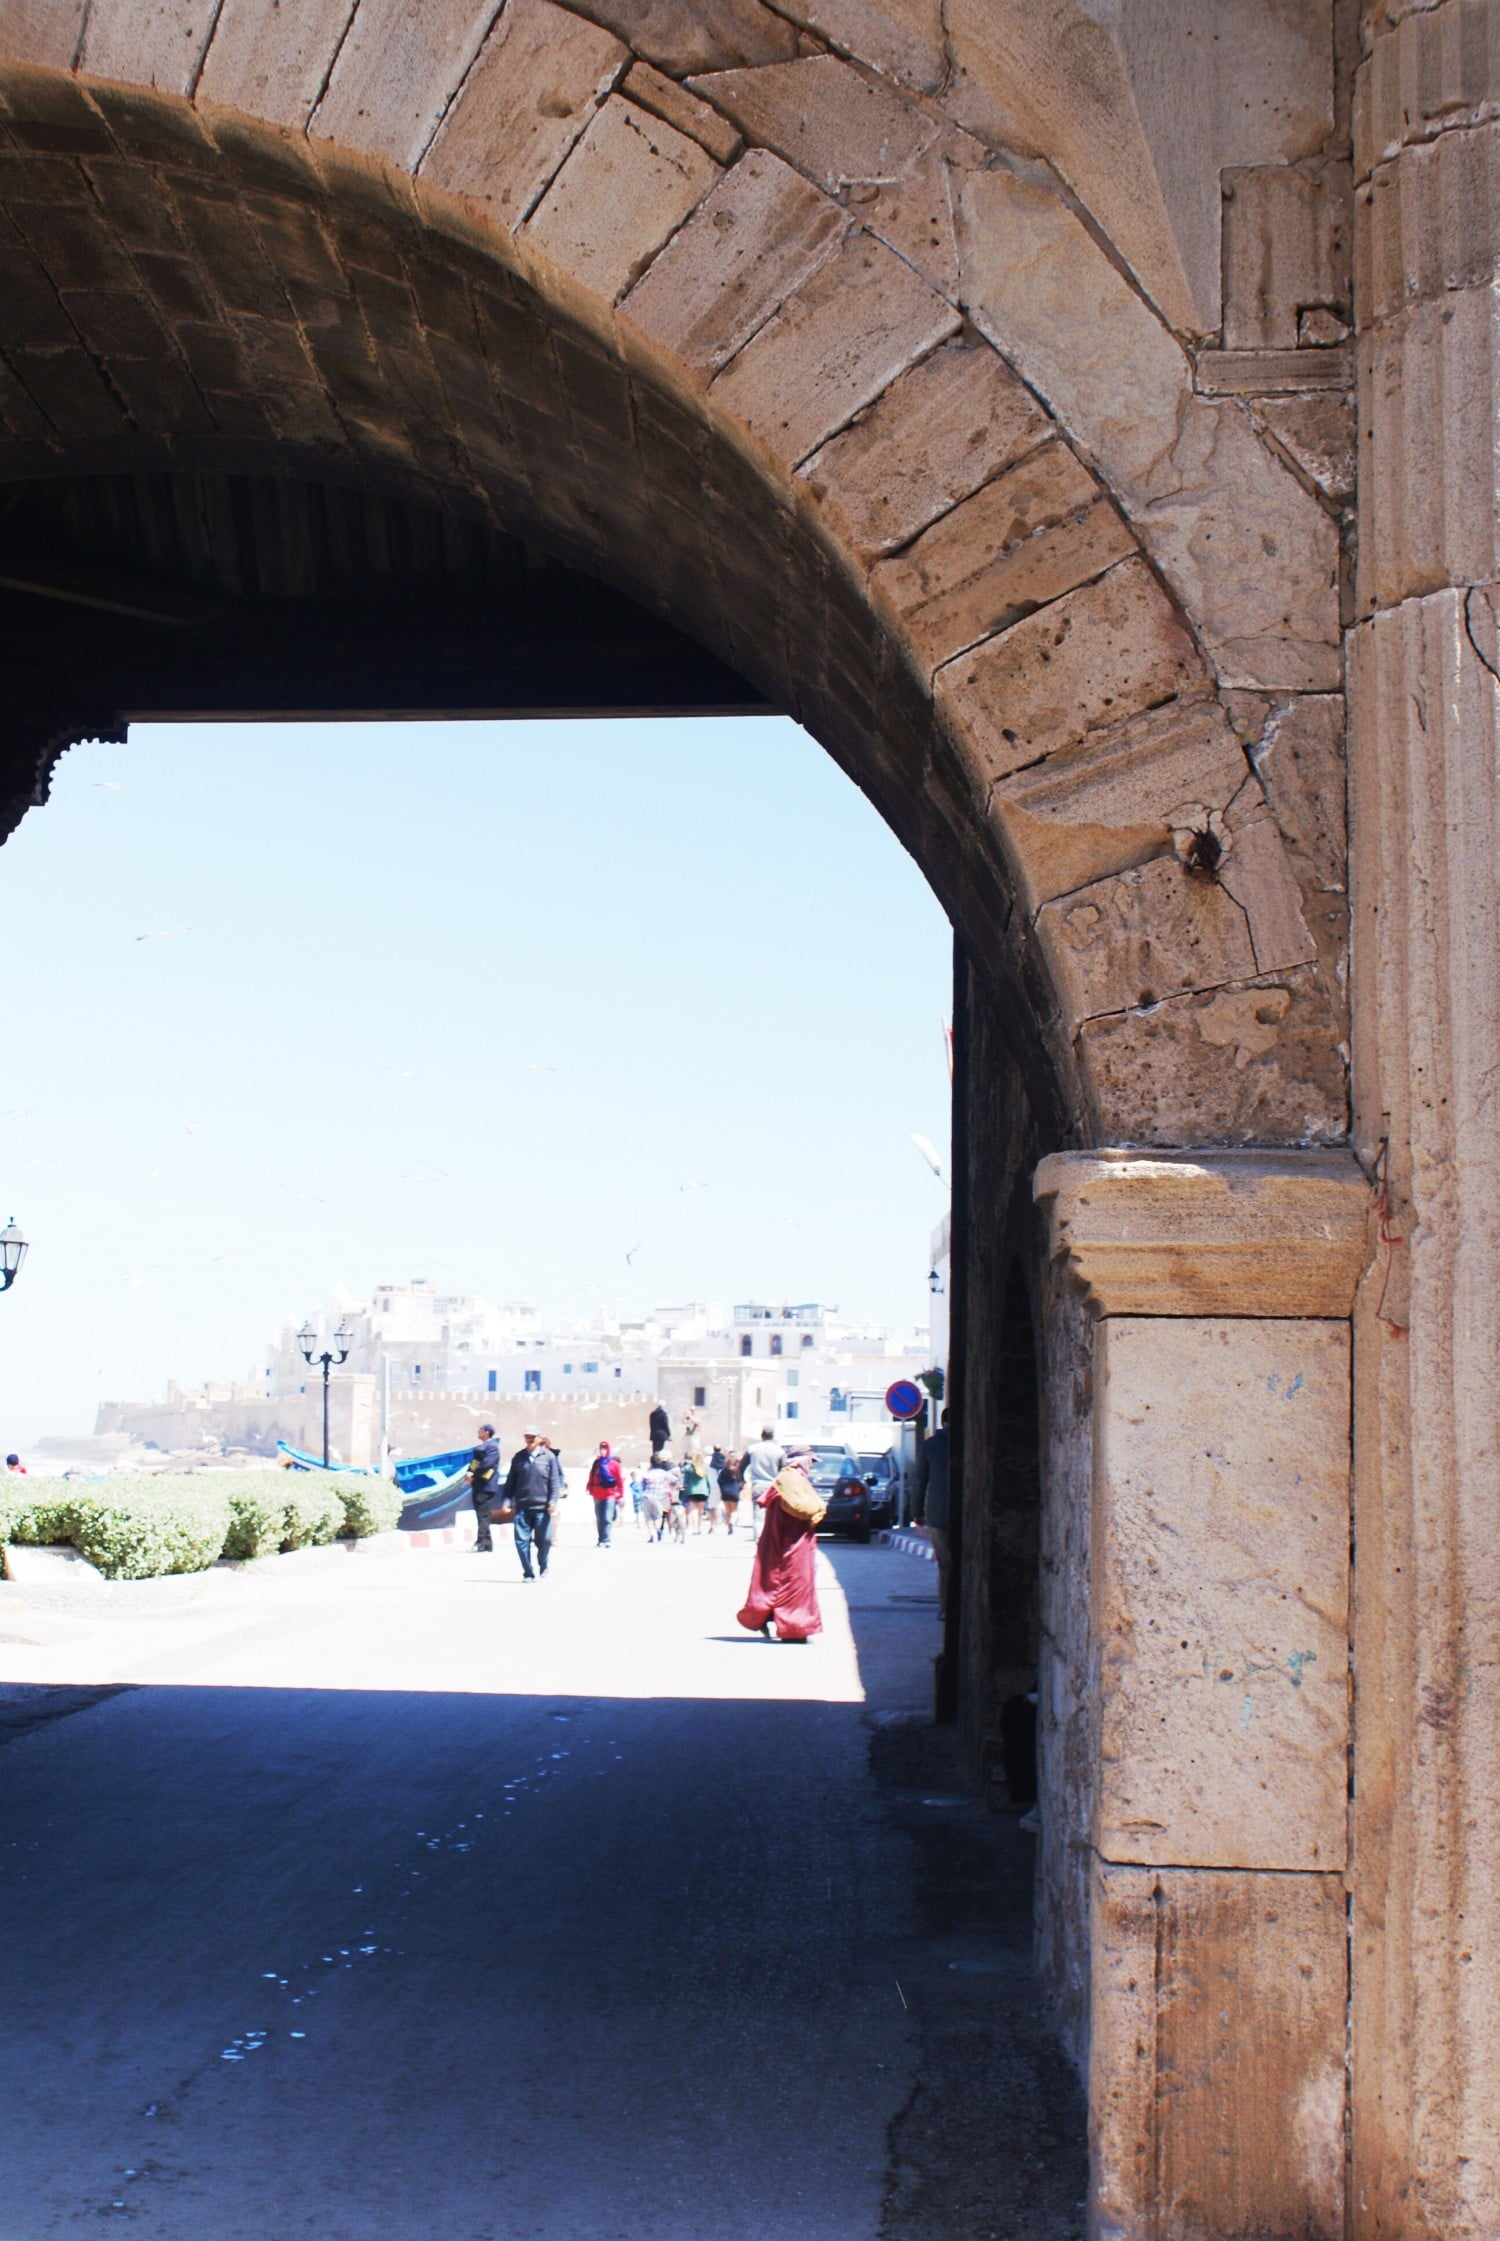 Walled city of Essaouira - Medina